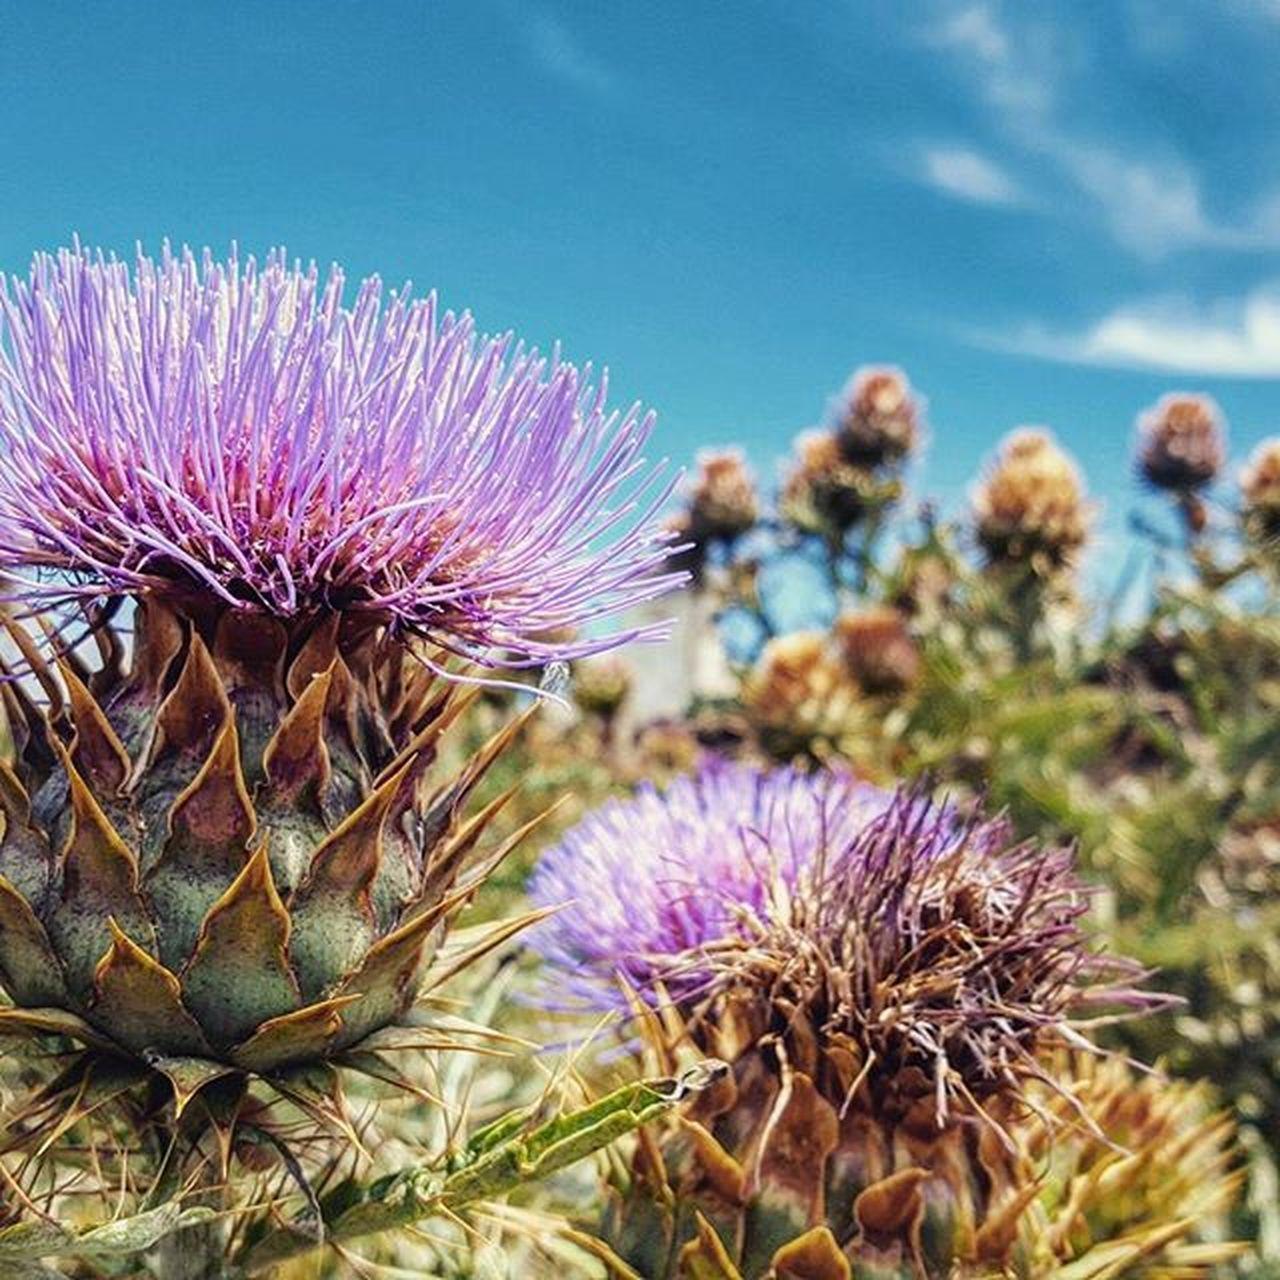 Muy buenos días a tod@s! Cardo Flower Violet Yuyos Nature Ig_captures Natureza Ig_nature Instagood